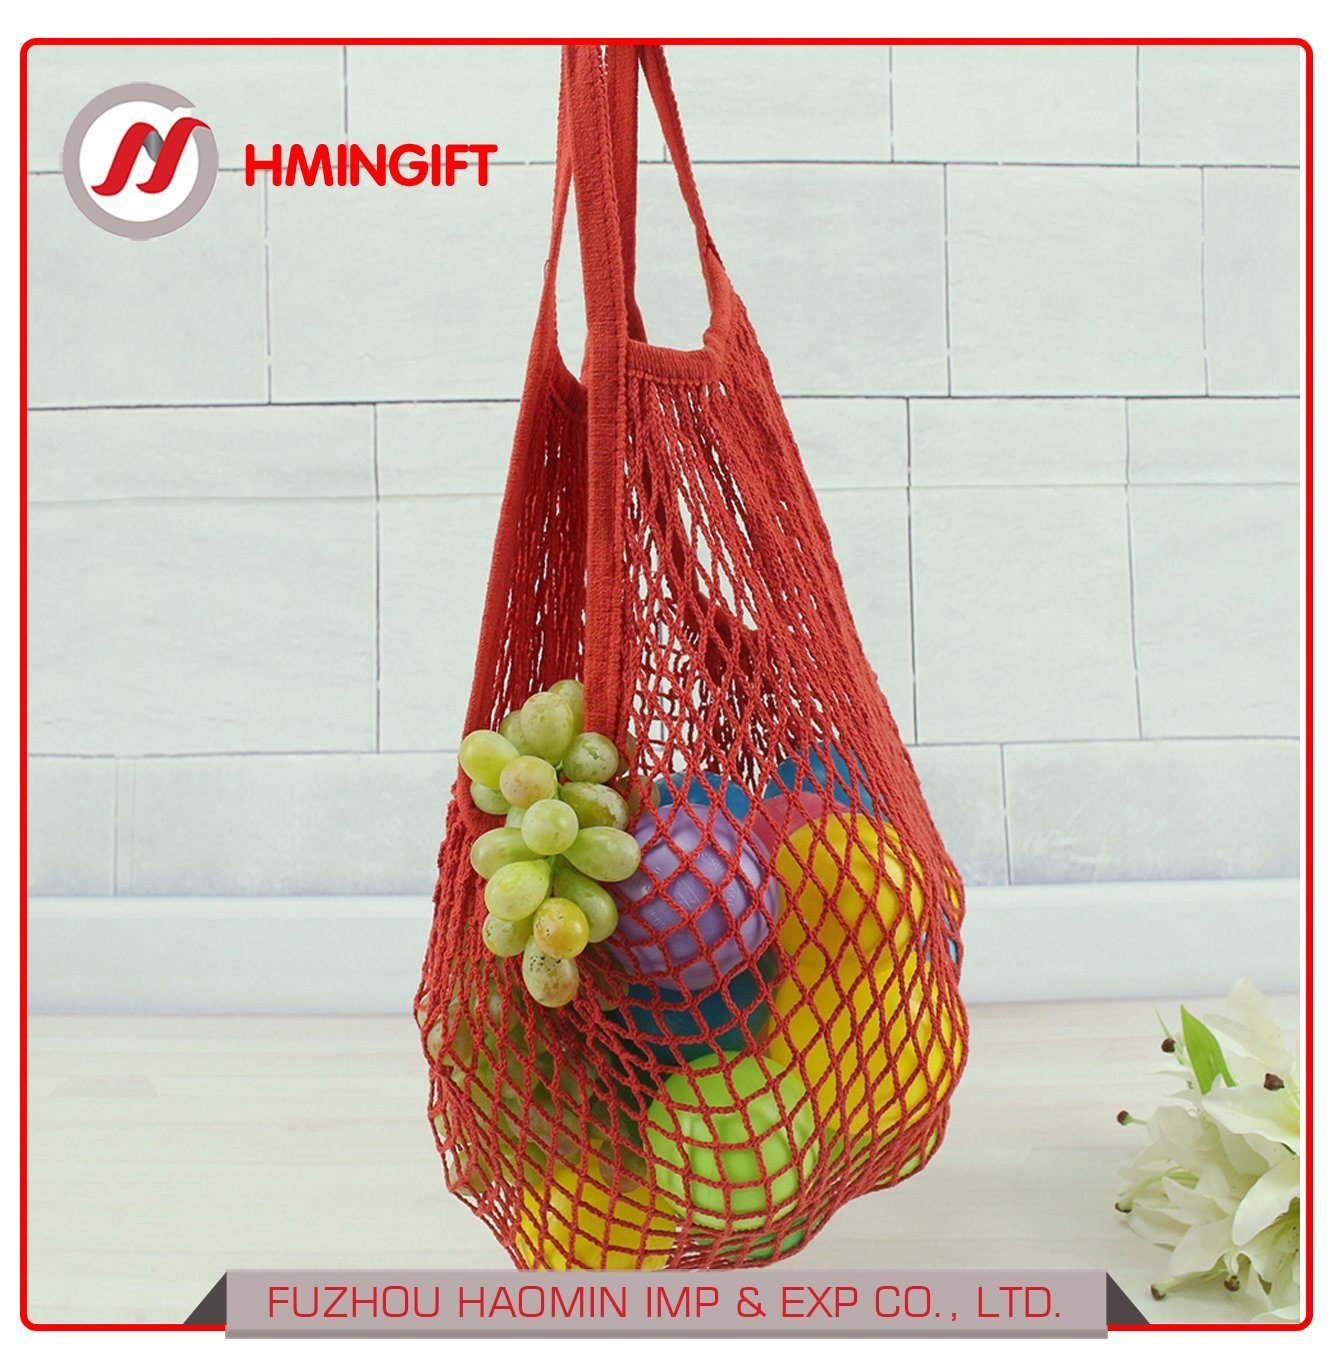 7a275b9f5274 China Portable Reusable Mesh Cotton Net String Bag Organizer ...